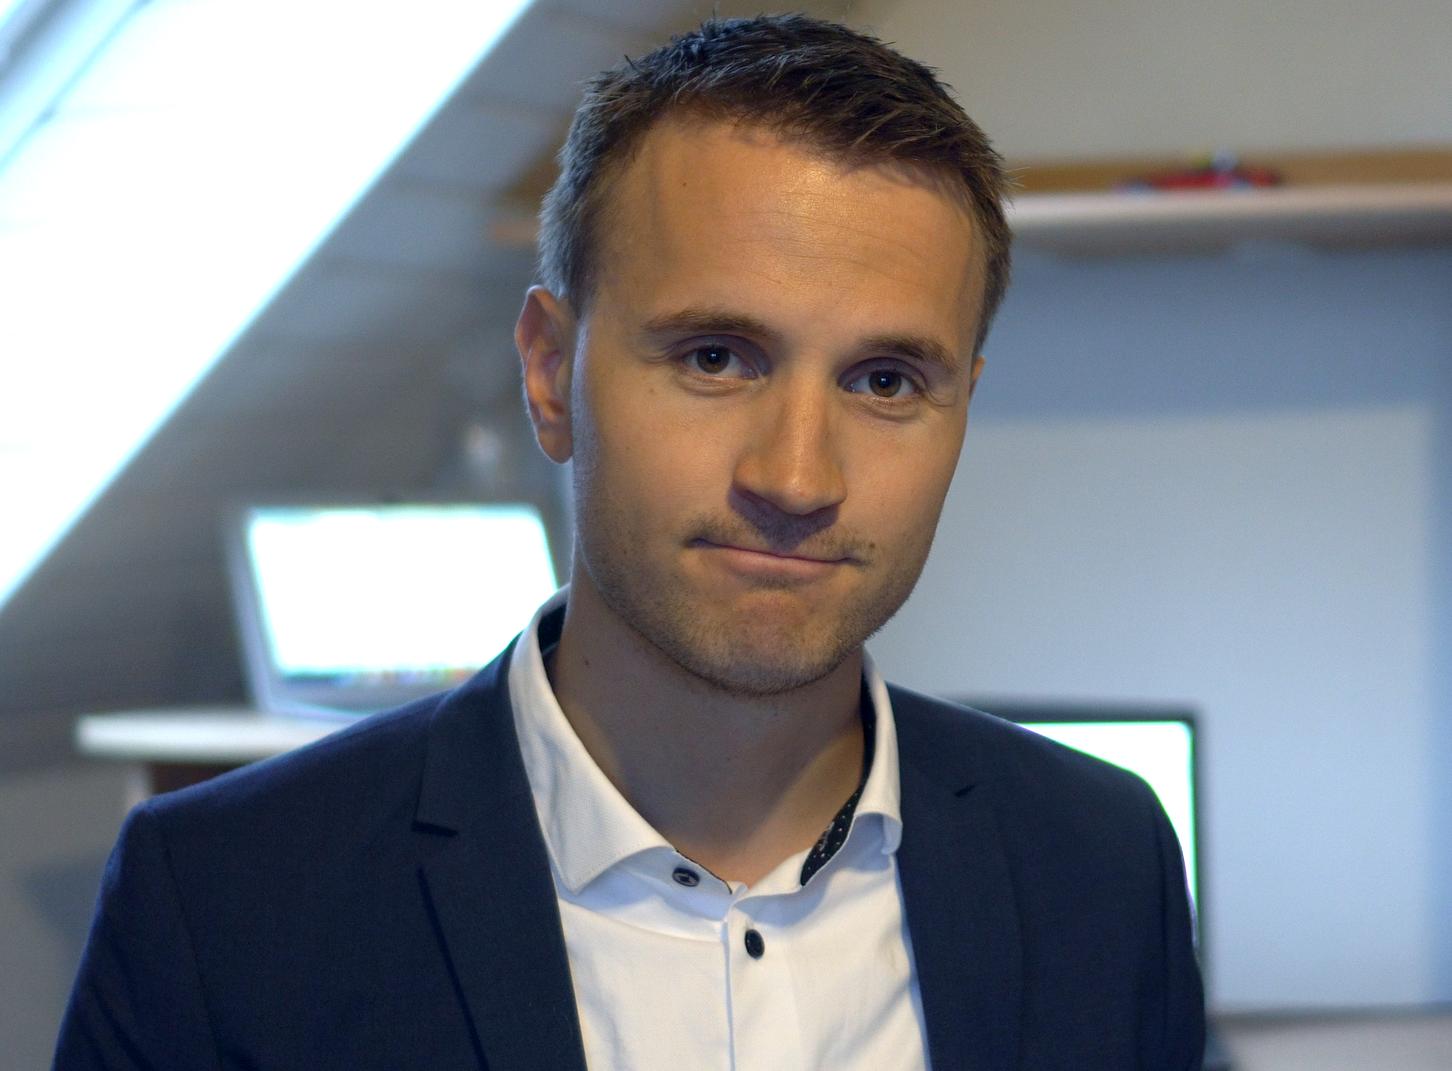 Picture of Alexander Bojsen